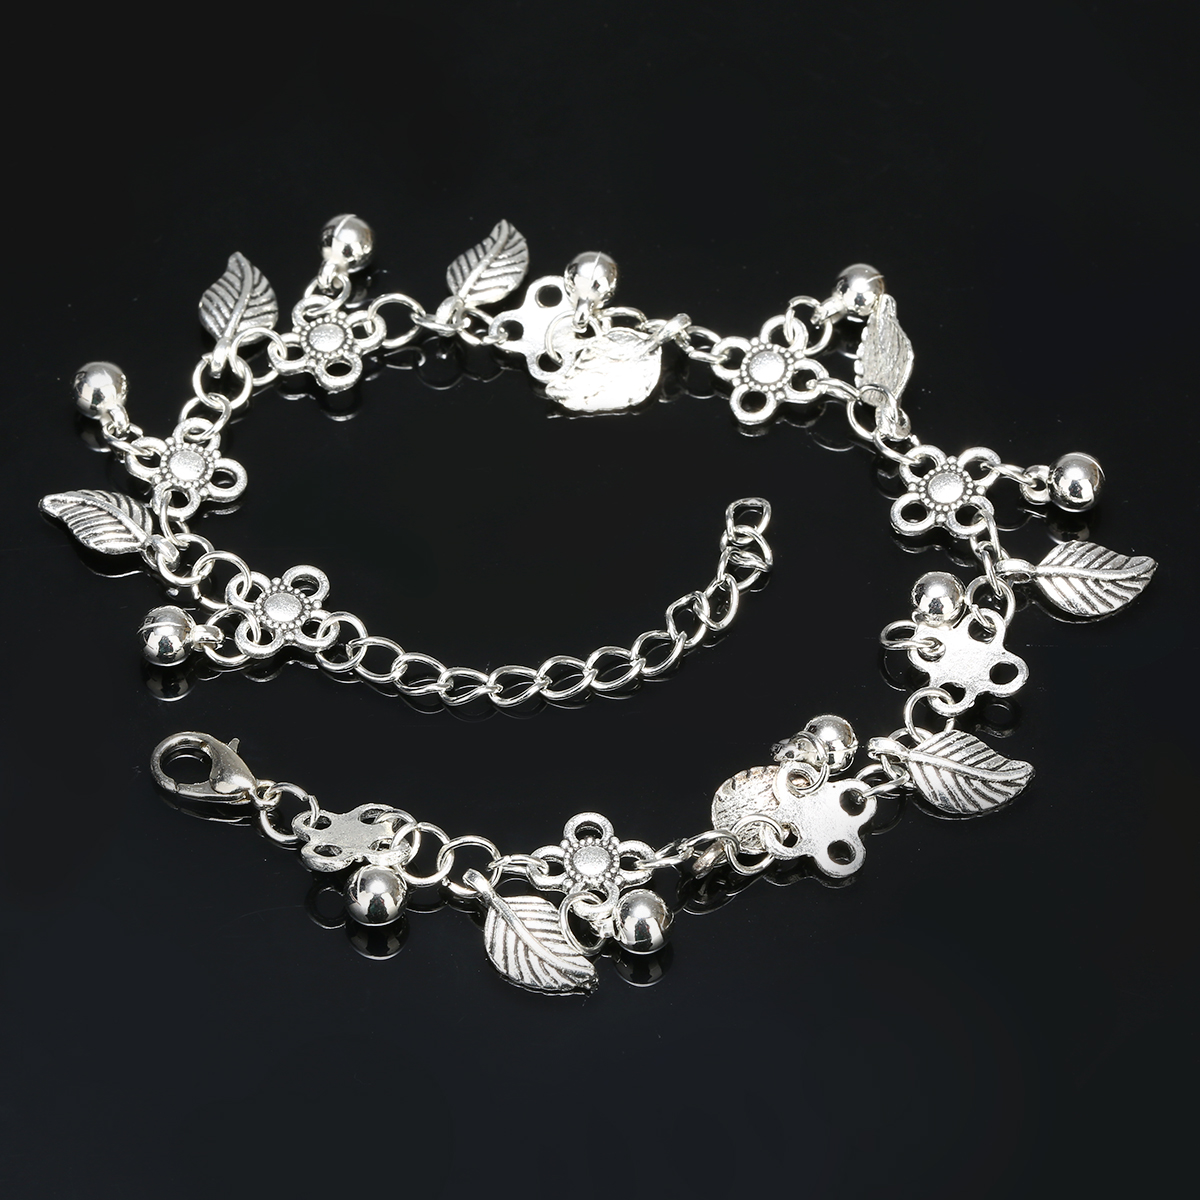 Bohemia Silver Water Drops Leaf Tassel Anklet Foot Chain New Design Drop Ankle Bracelet Summer Ocean Beach Jewelry Shellhard